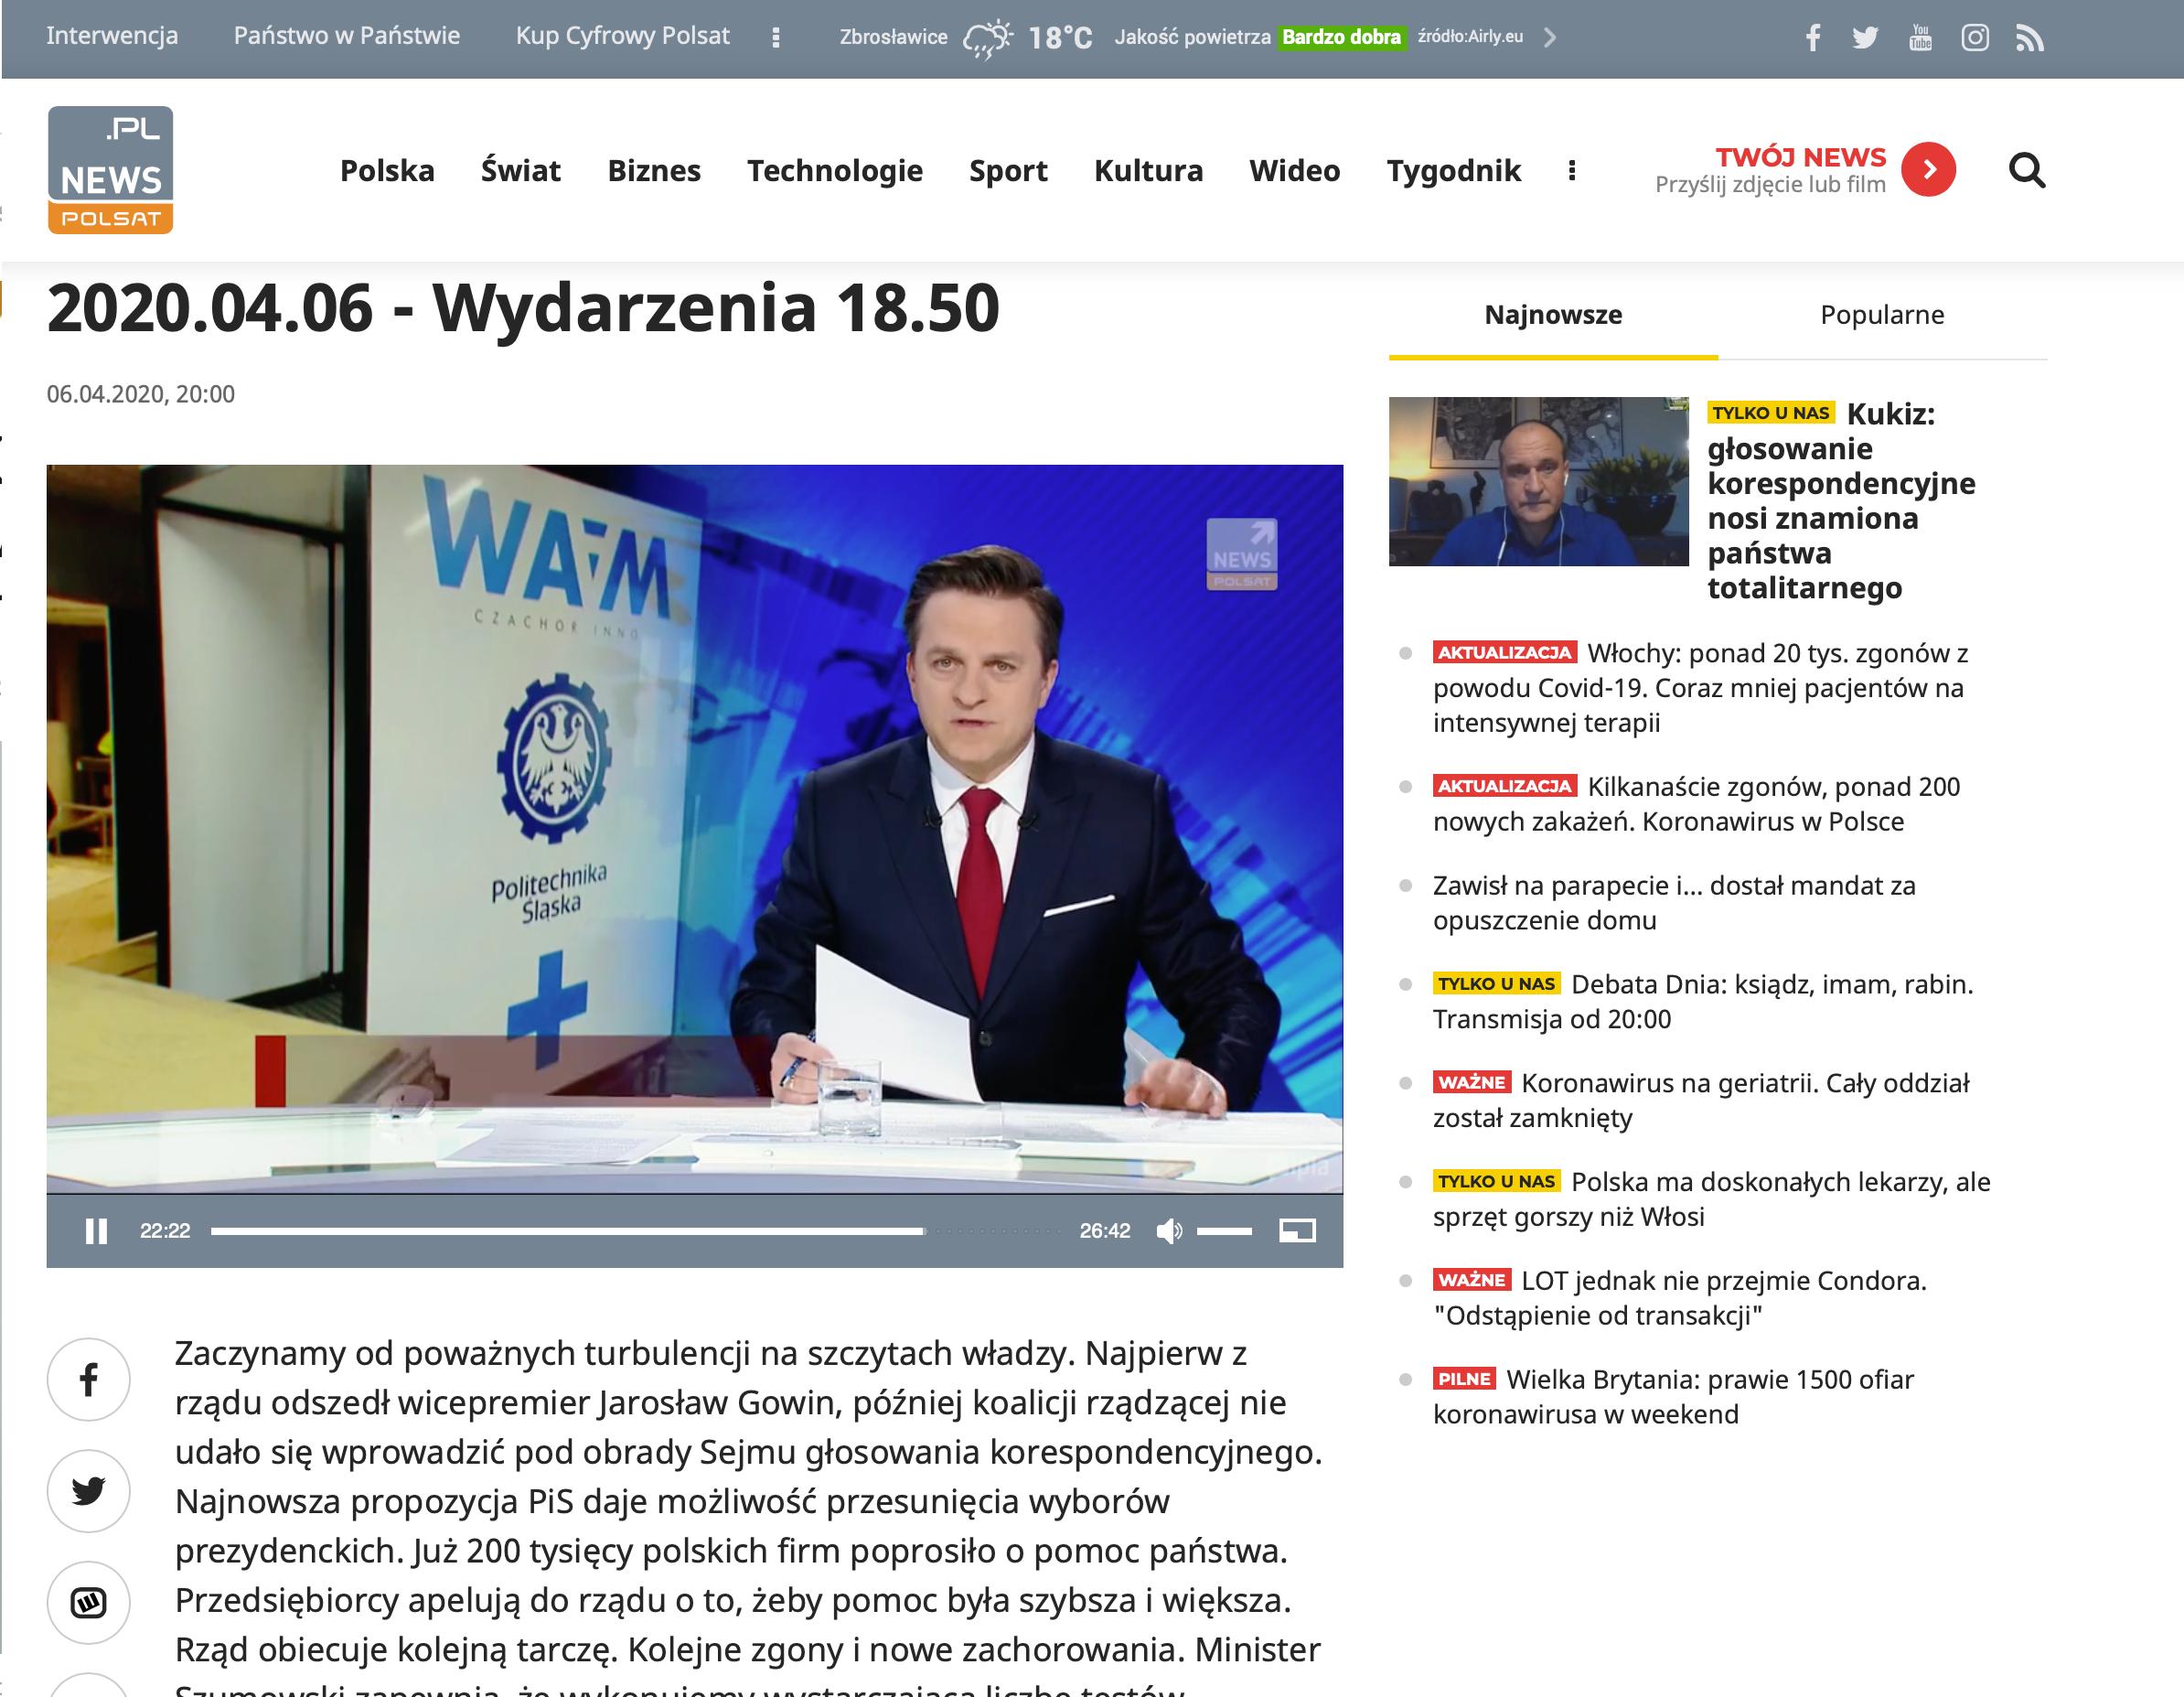 POLSAT NEWS 6.04.2020